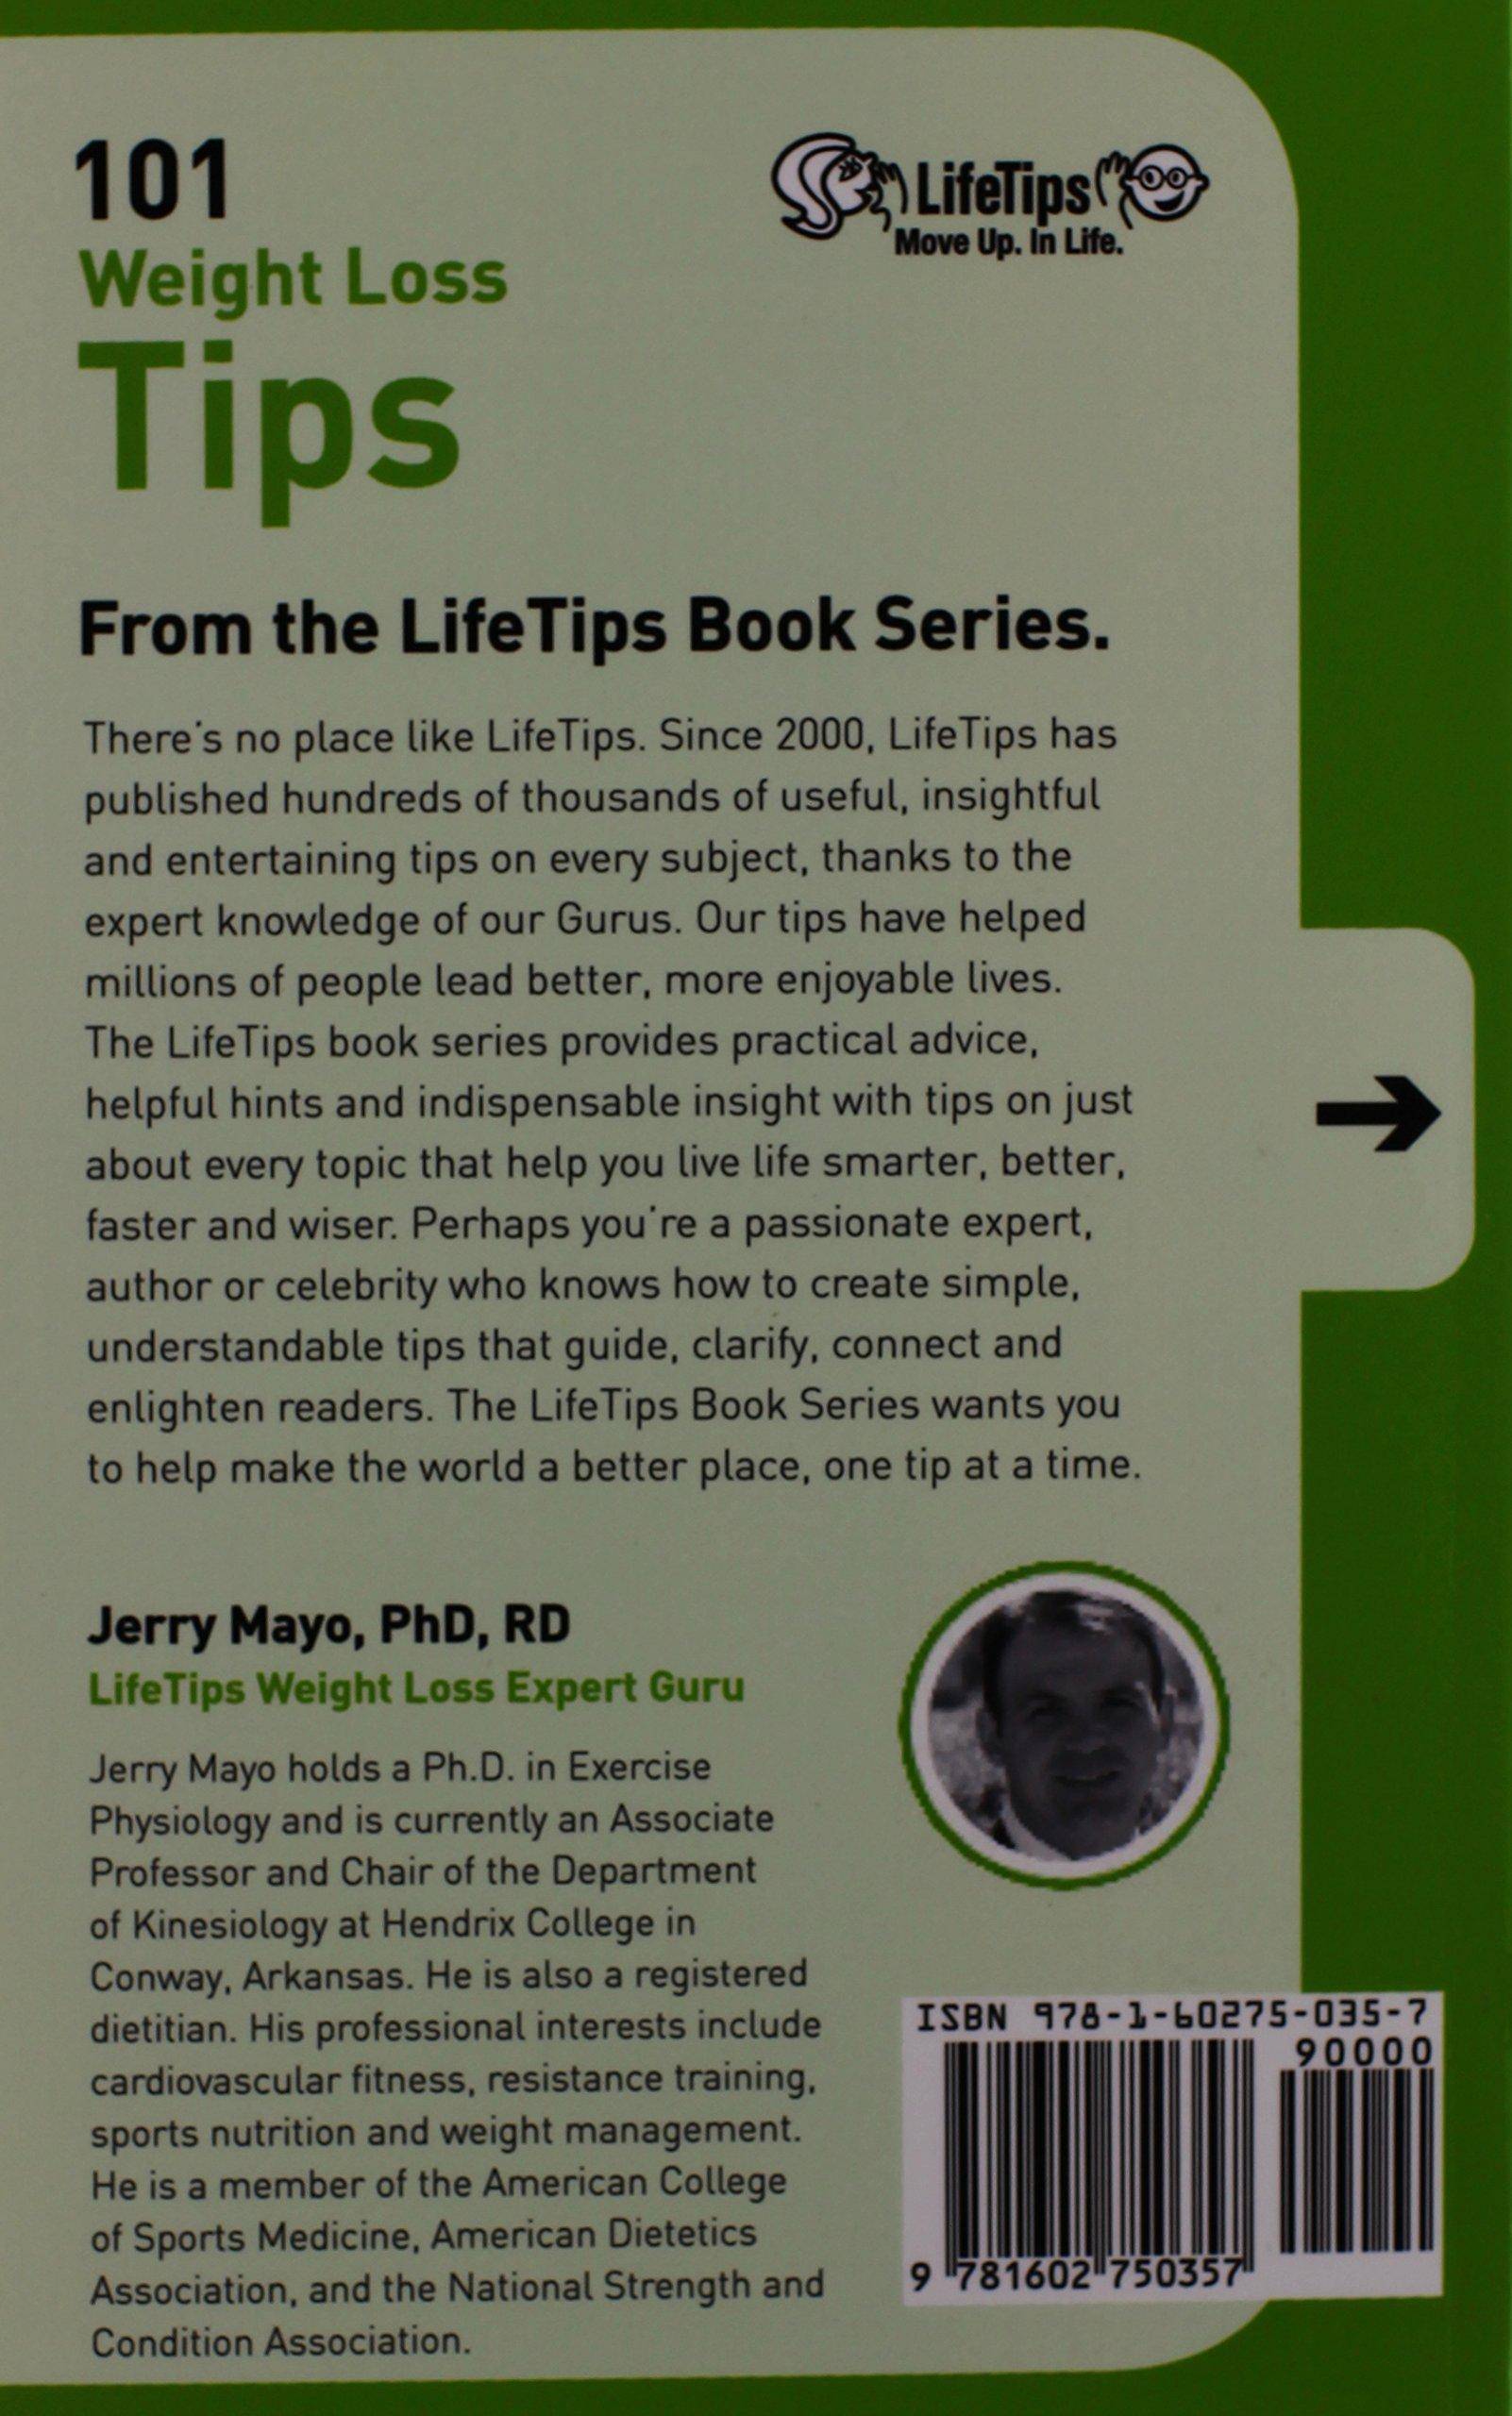 101 Weight Loss Tips (Life Tips Books): Jerry Mayo: 9781602750357:  Amazon.com: Books